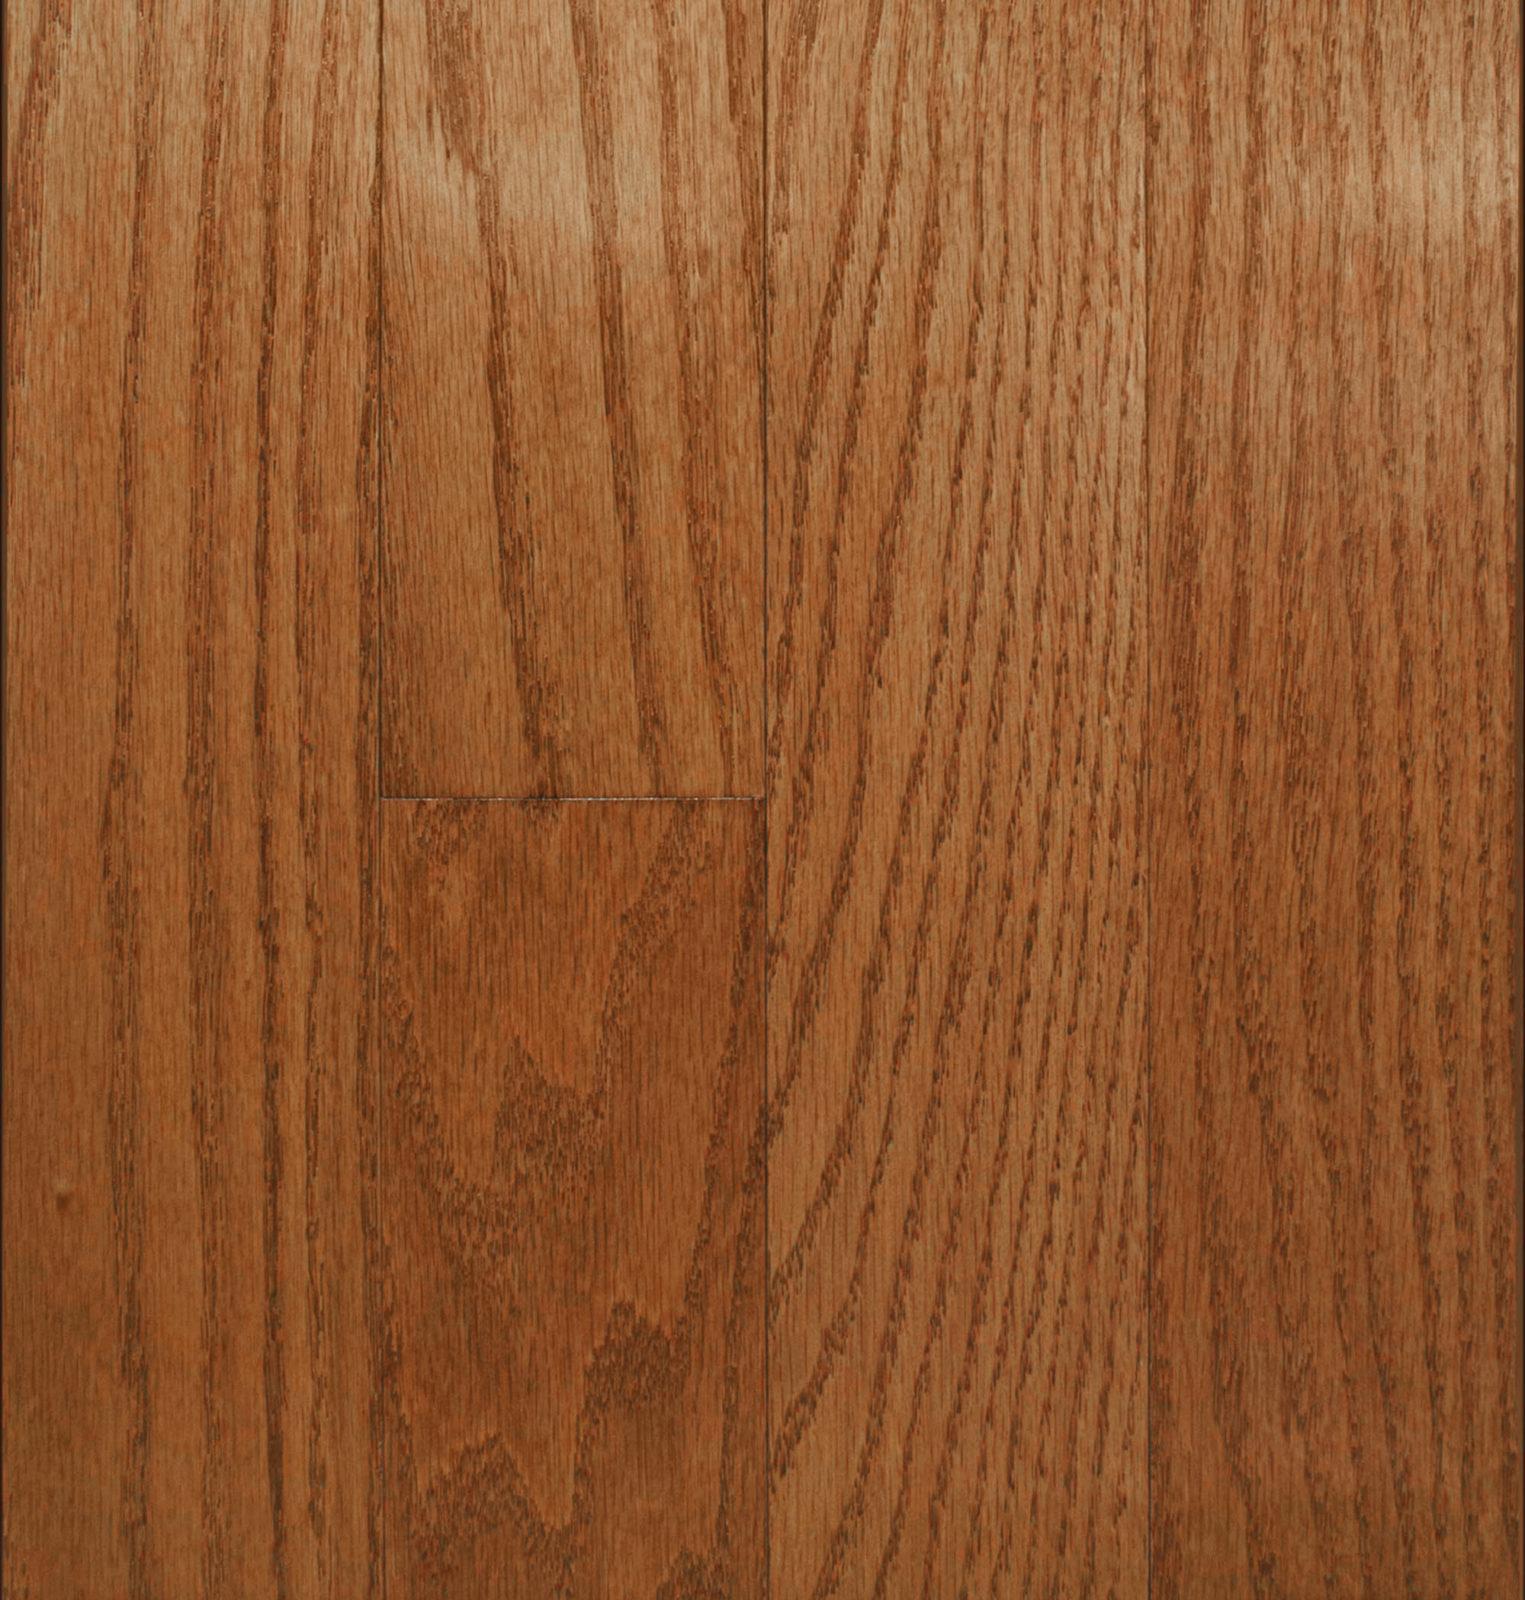 mohawk hardwood flooring mohawk red oak natural hardwood flooring SLXZQEM